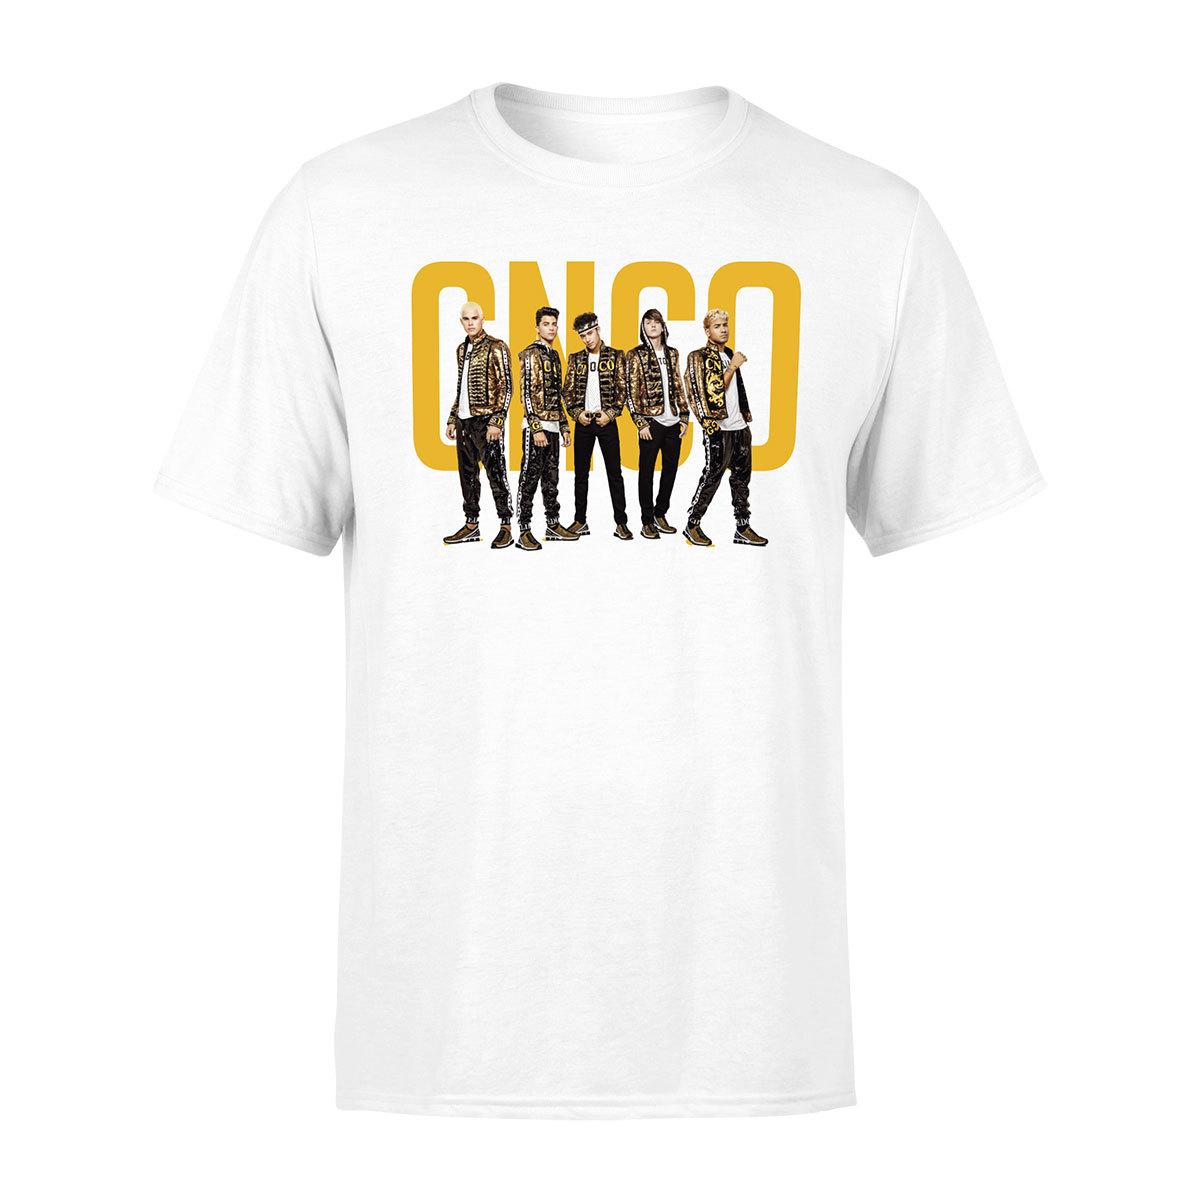 CNCO - 2019 World Tour T-shirt